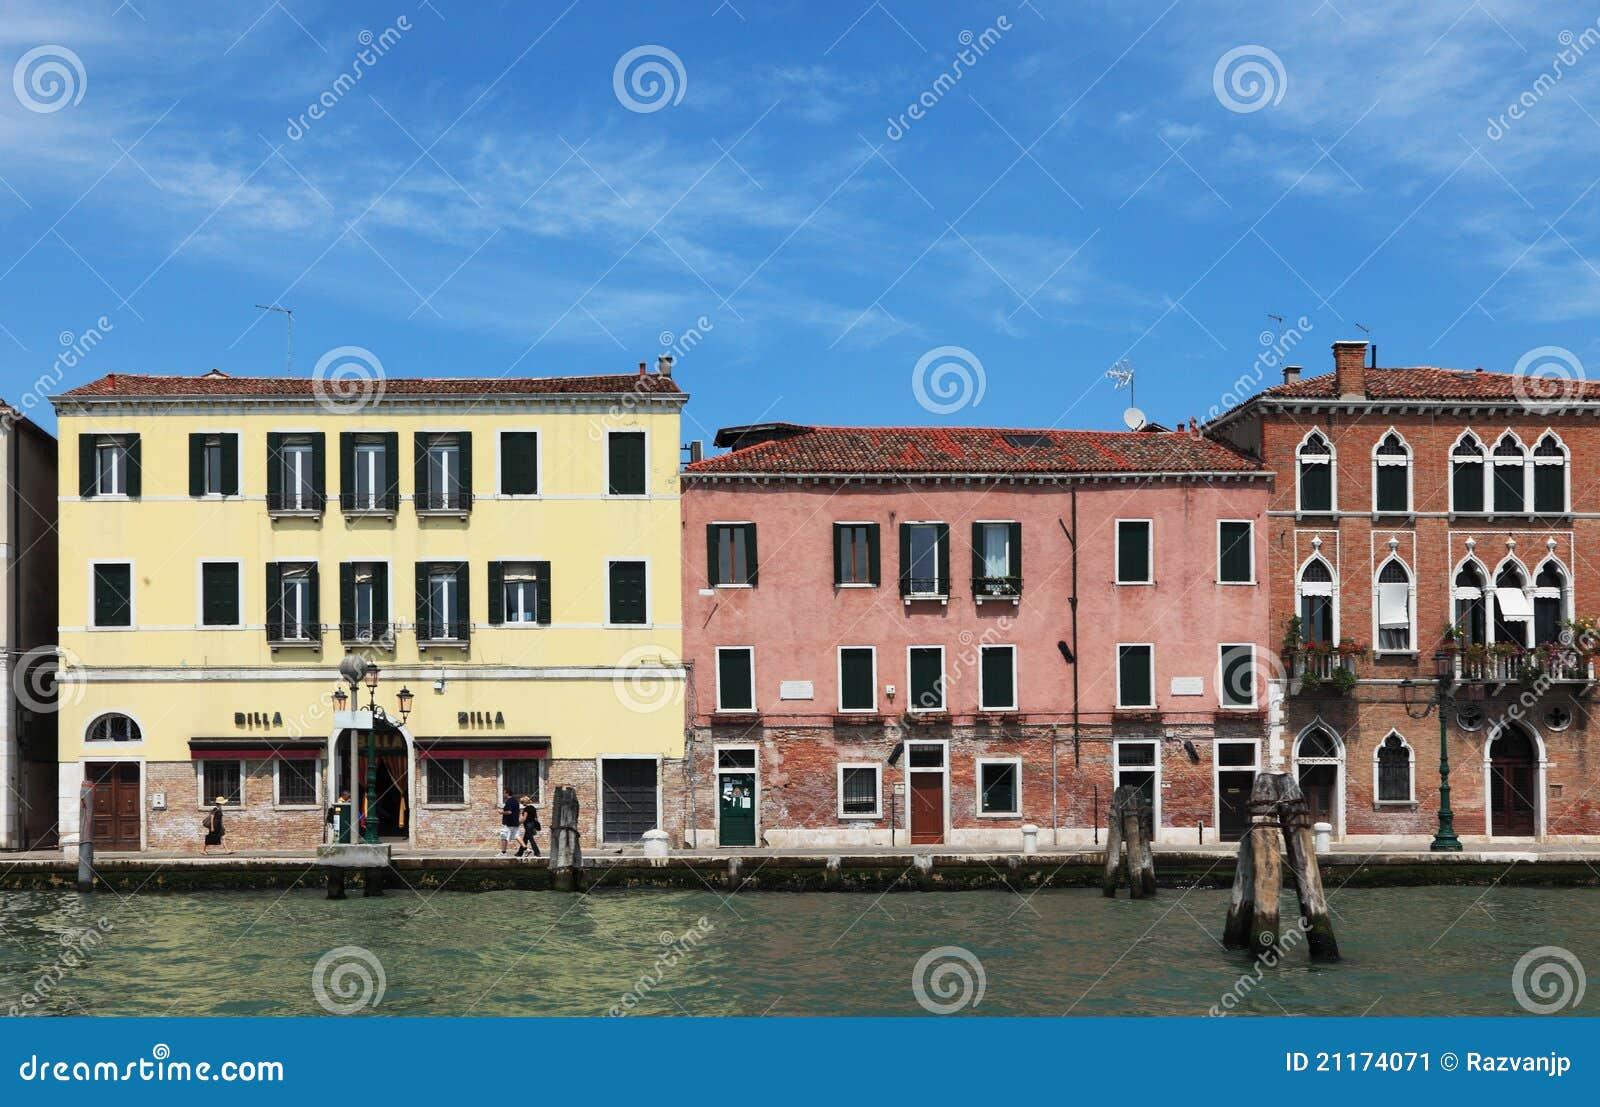 Case veneziane fotografia editoriale immagine di waterway for Tipi di case in italia